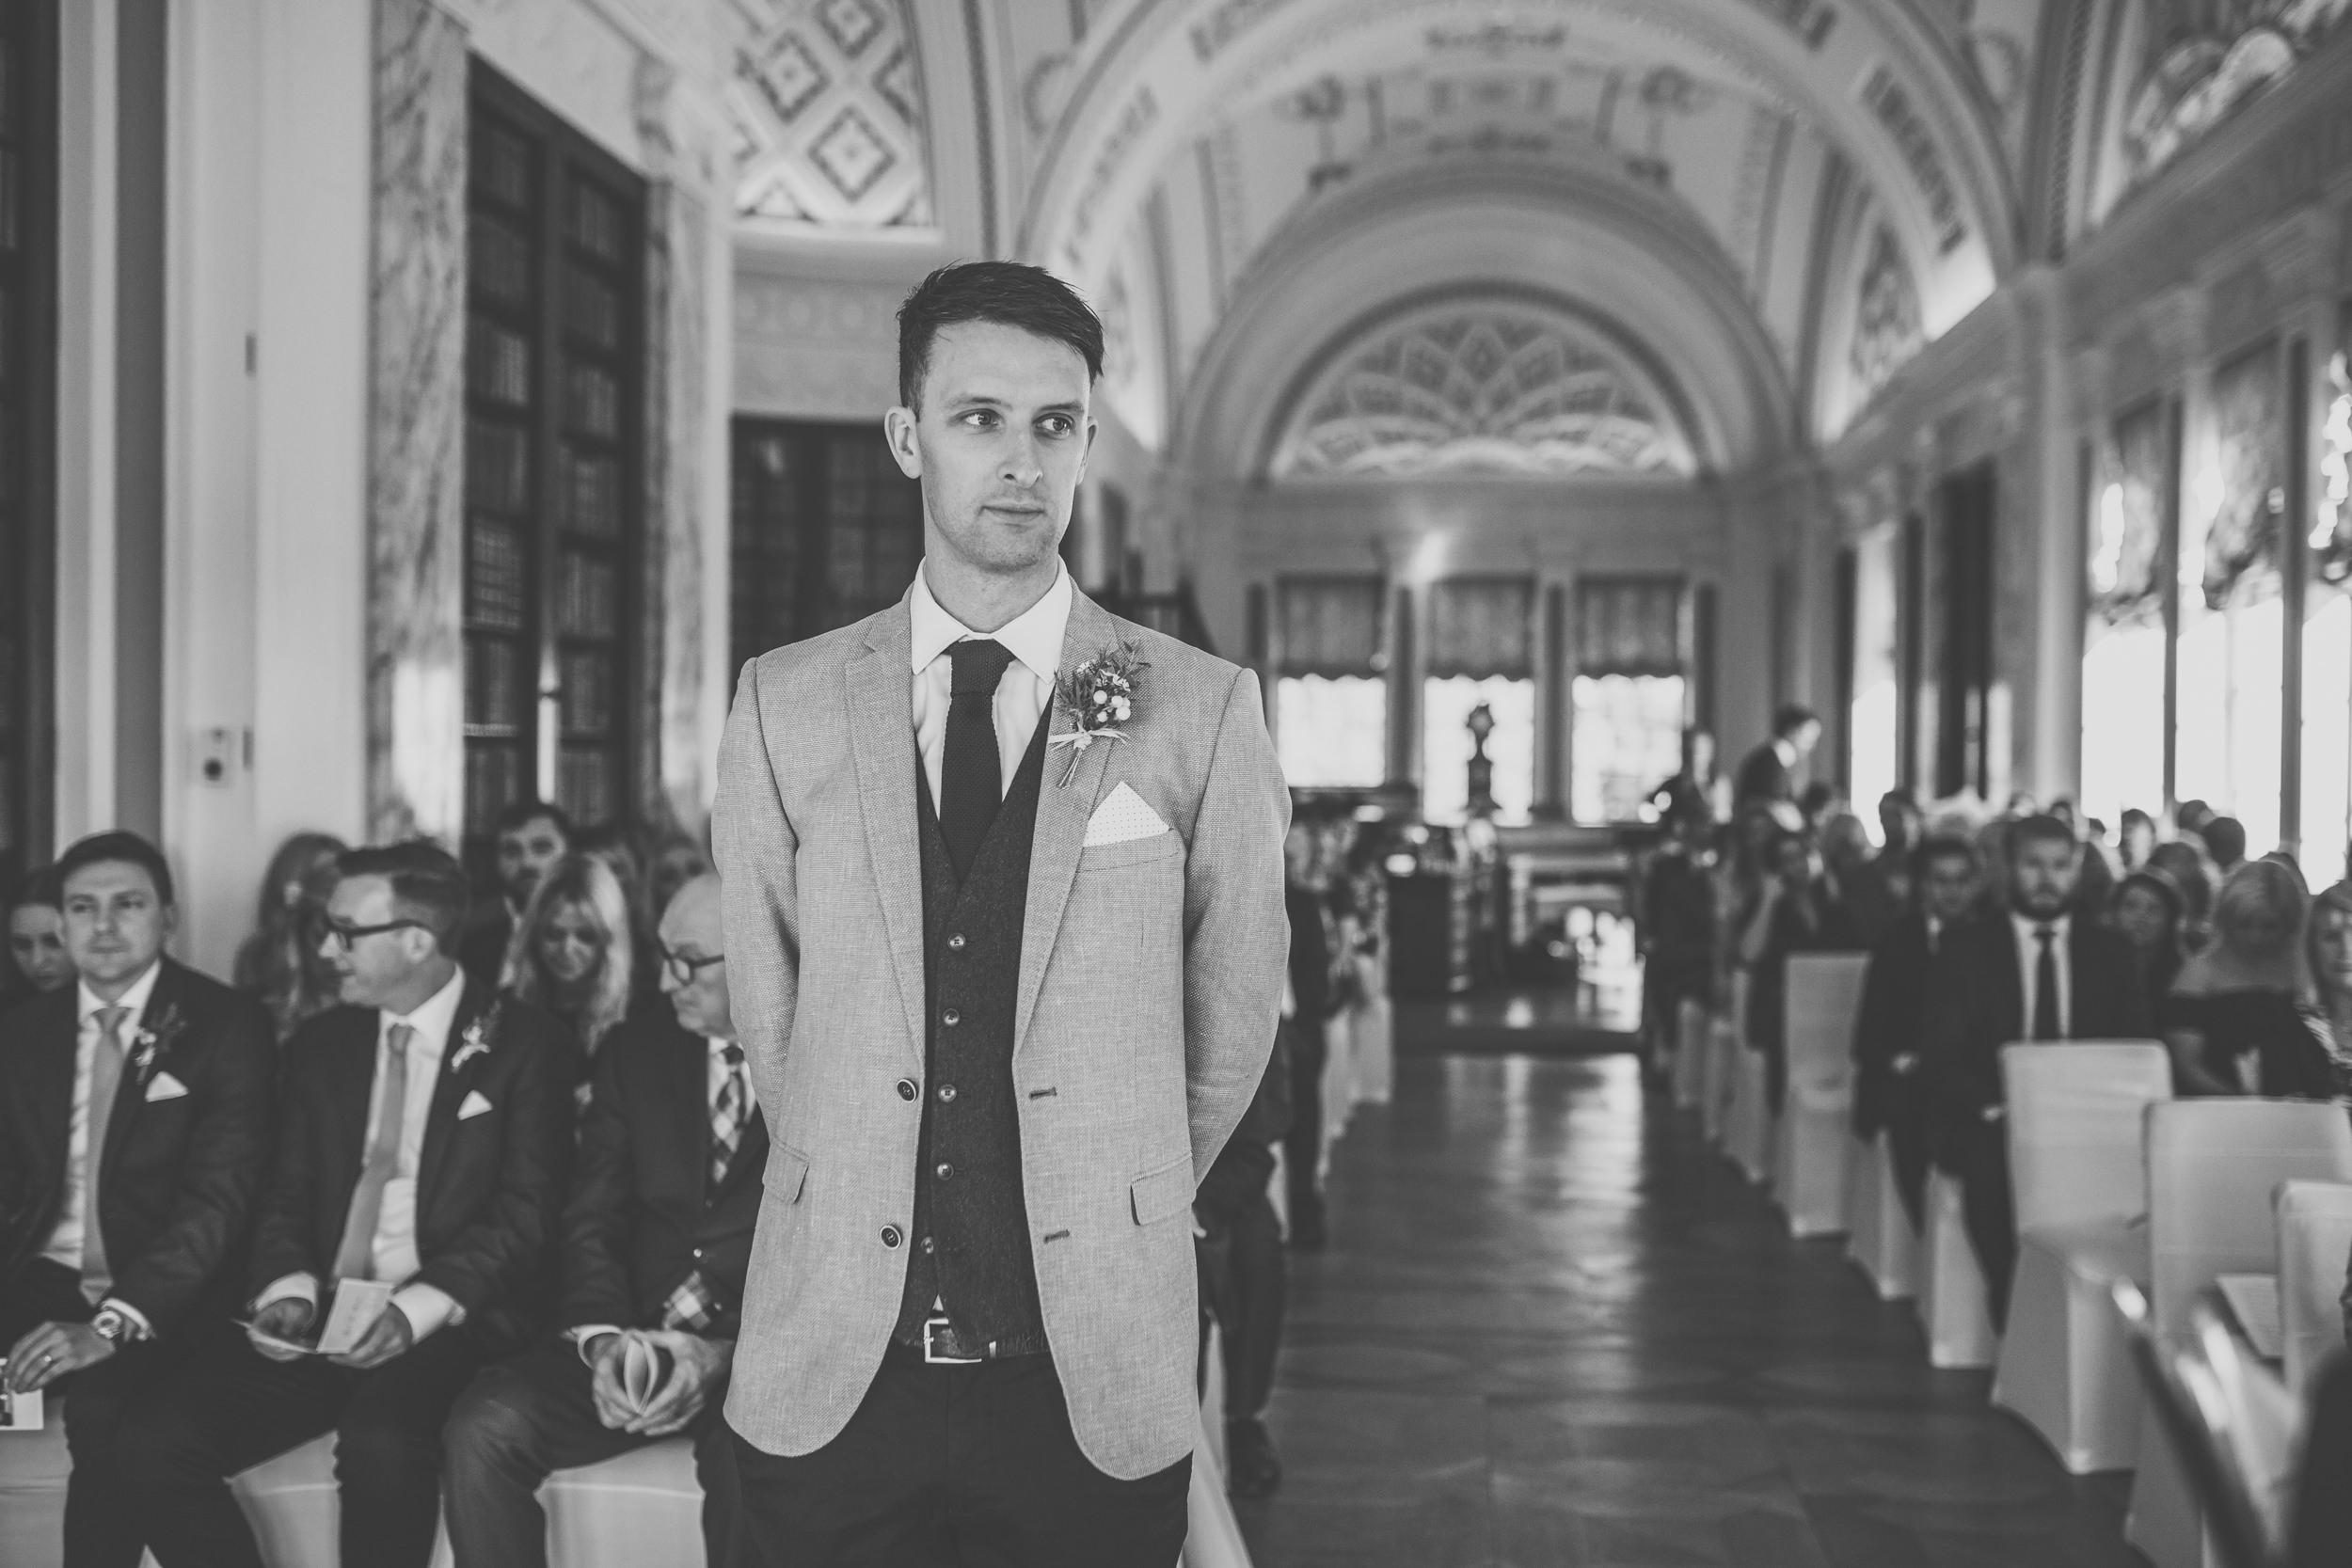 sledmere house wedding photographer venue yorkshire-24.jpg